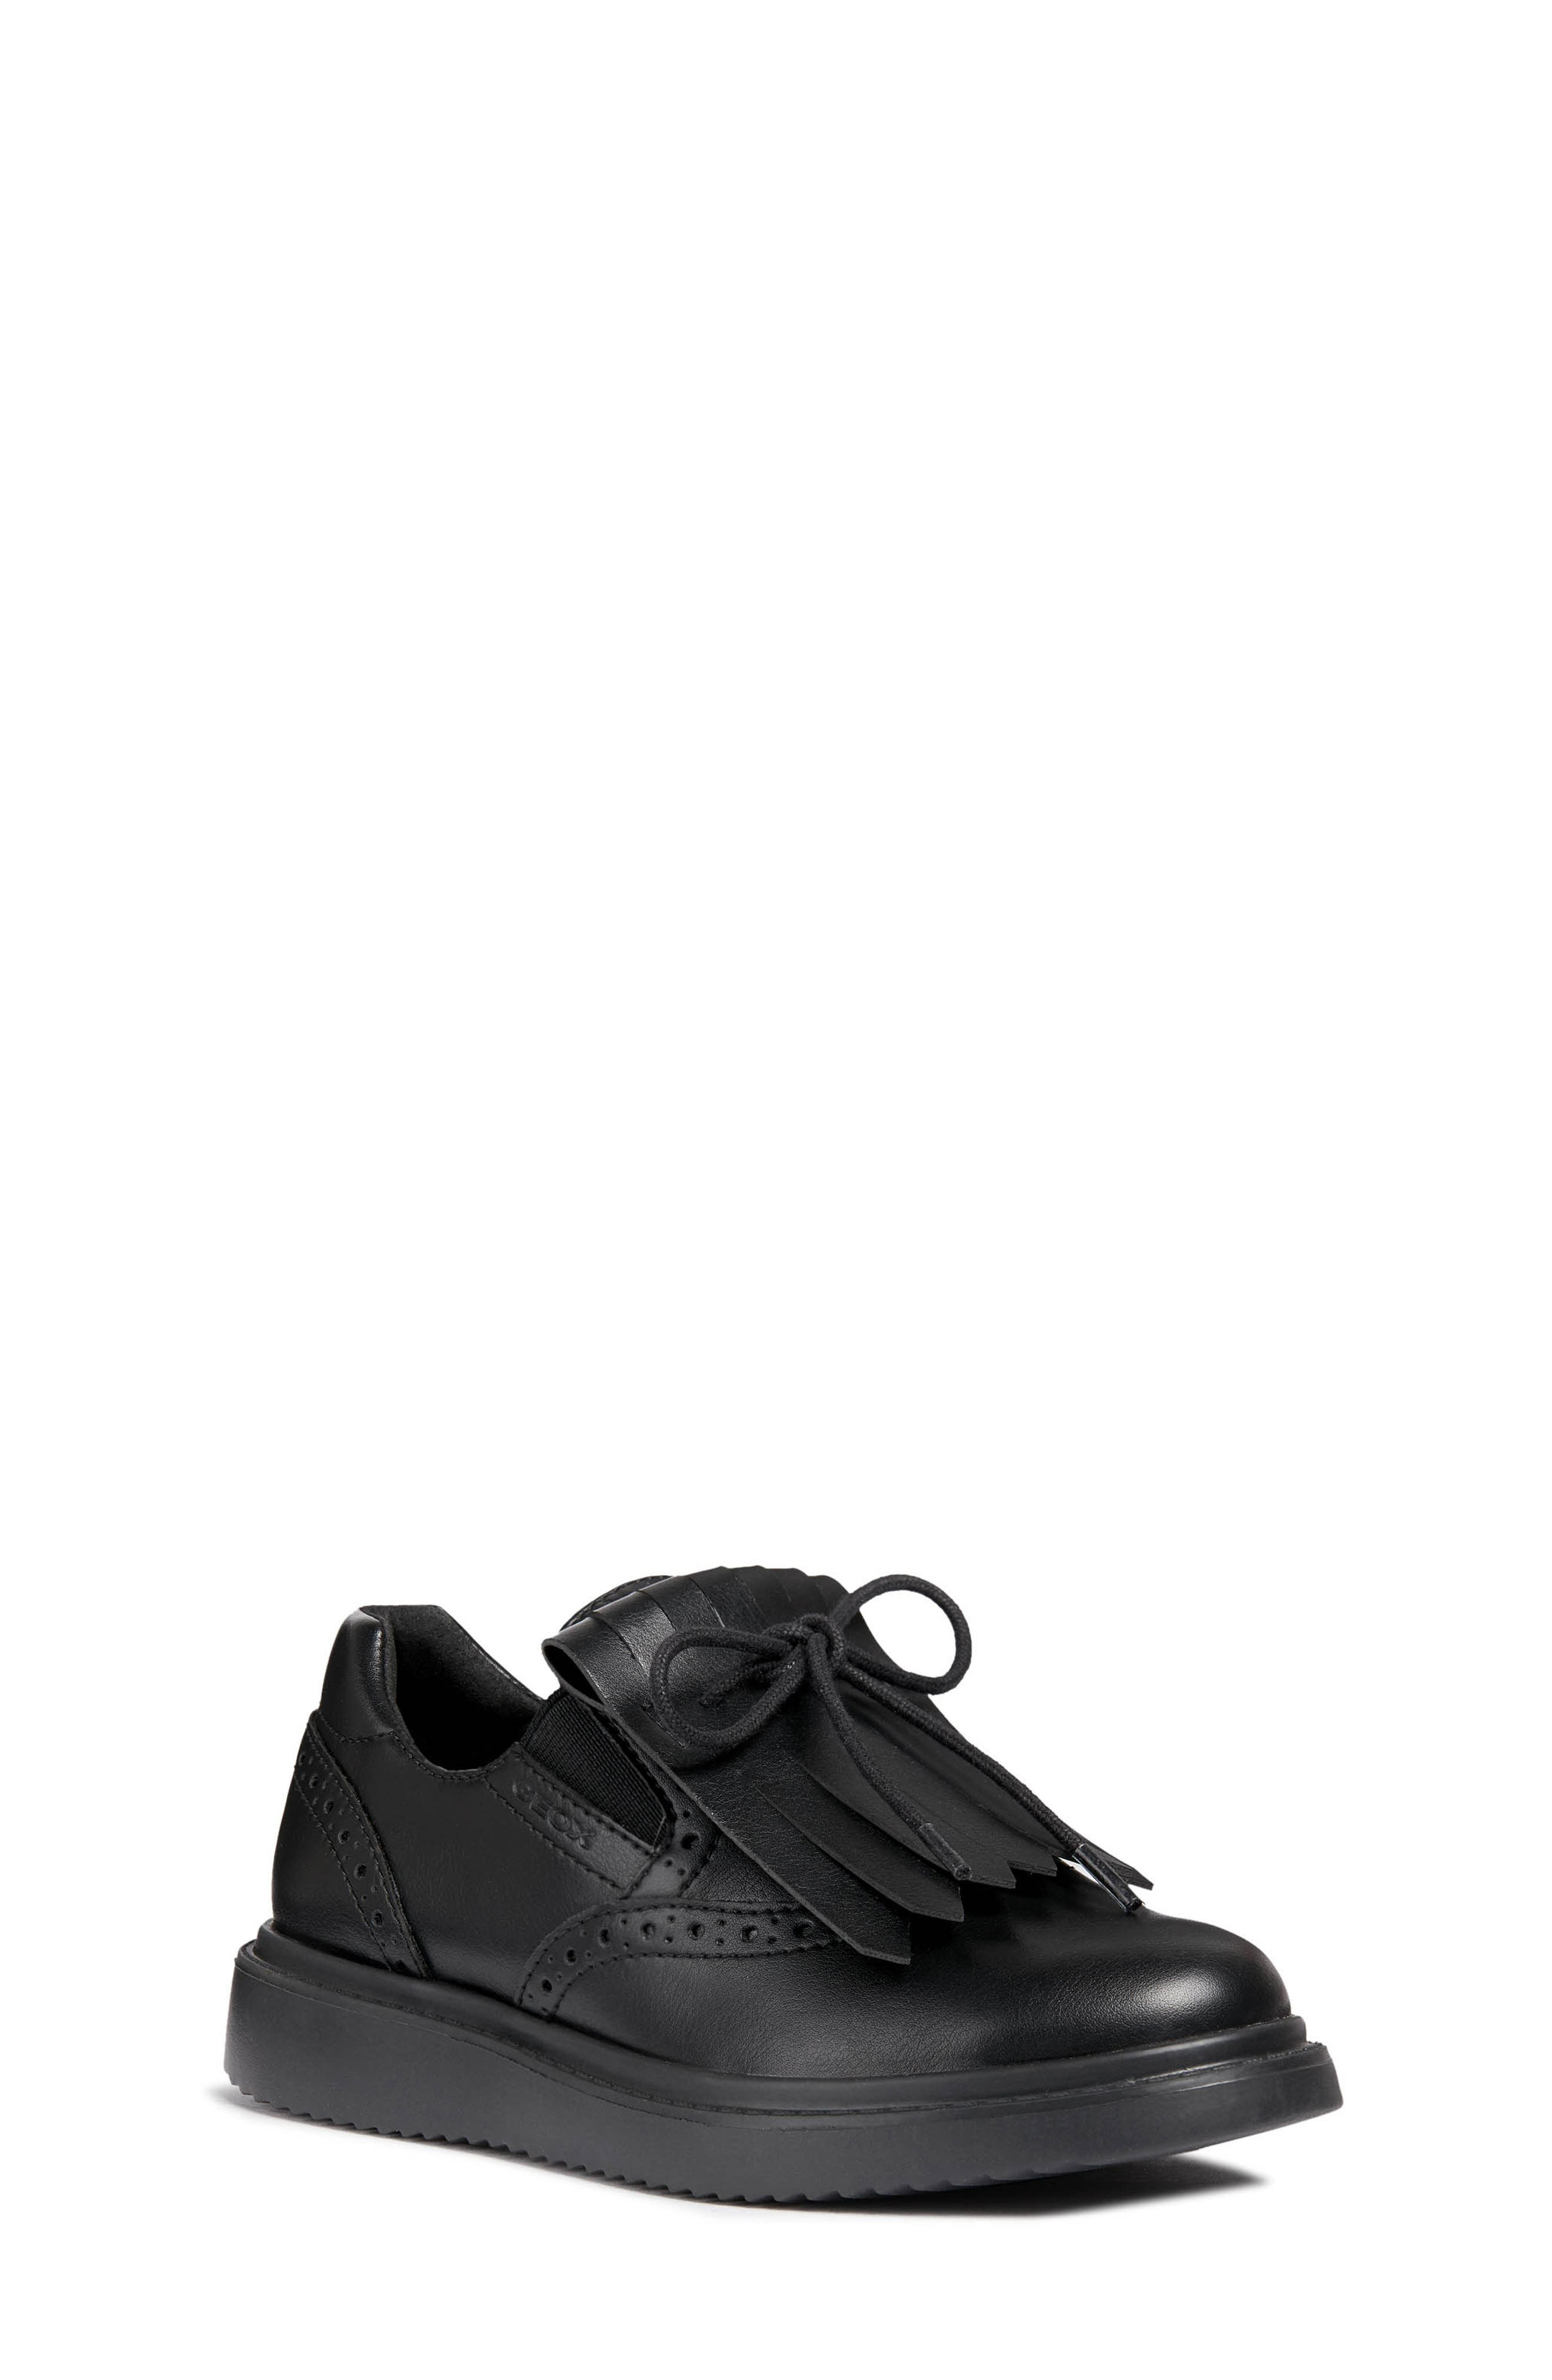 GEOX,                             Thymar Kiltie Fringe Sneaker,                             Main thumbnail 1, color,                             001